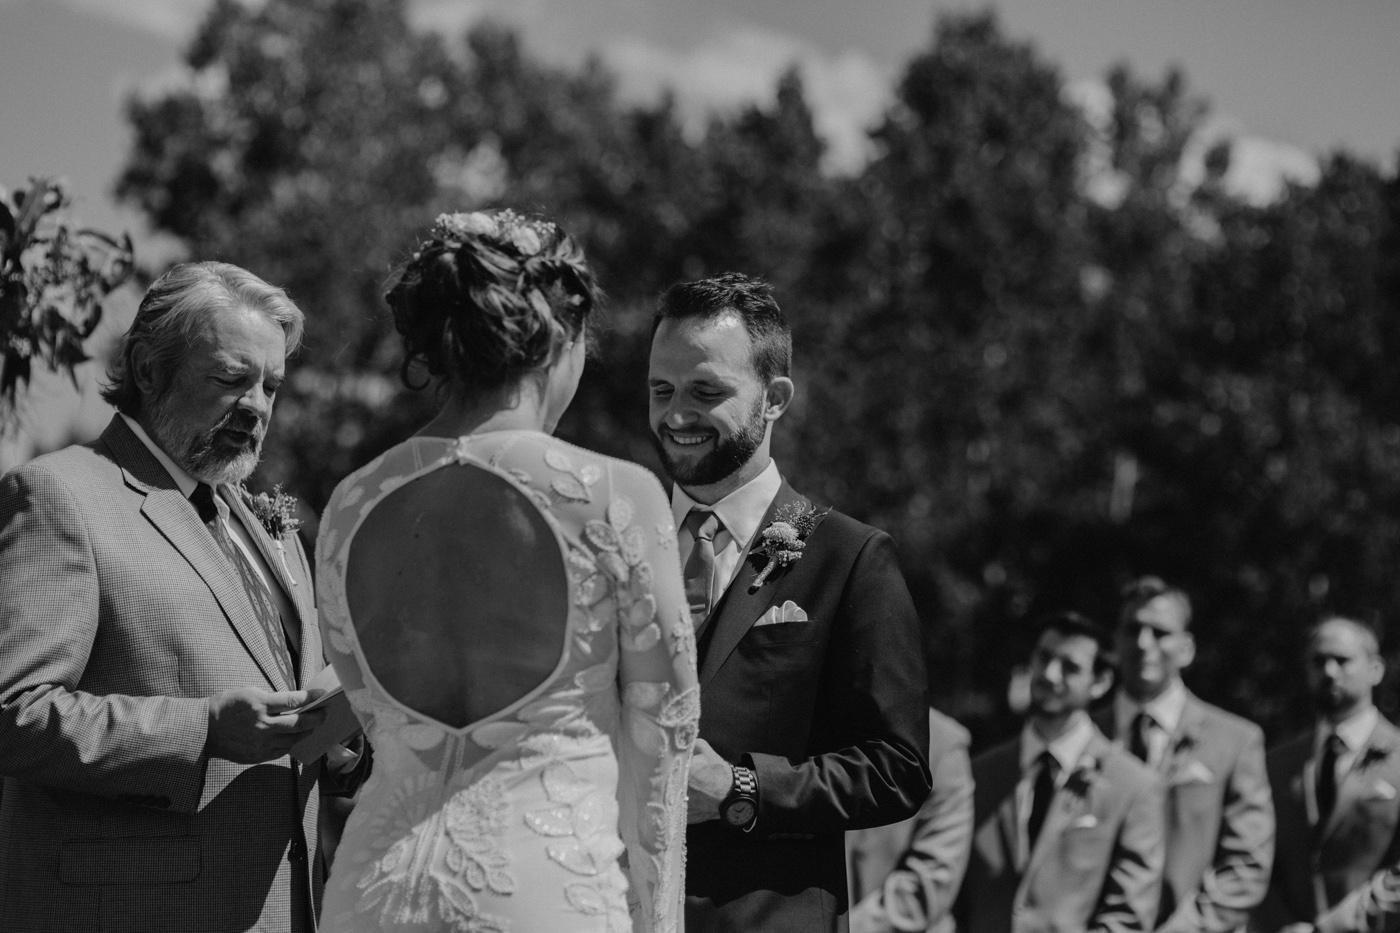 woods-walk-trail-crested-butte-colorado-wedding-47.jpg